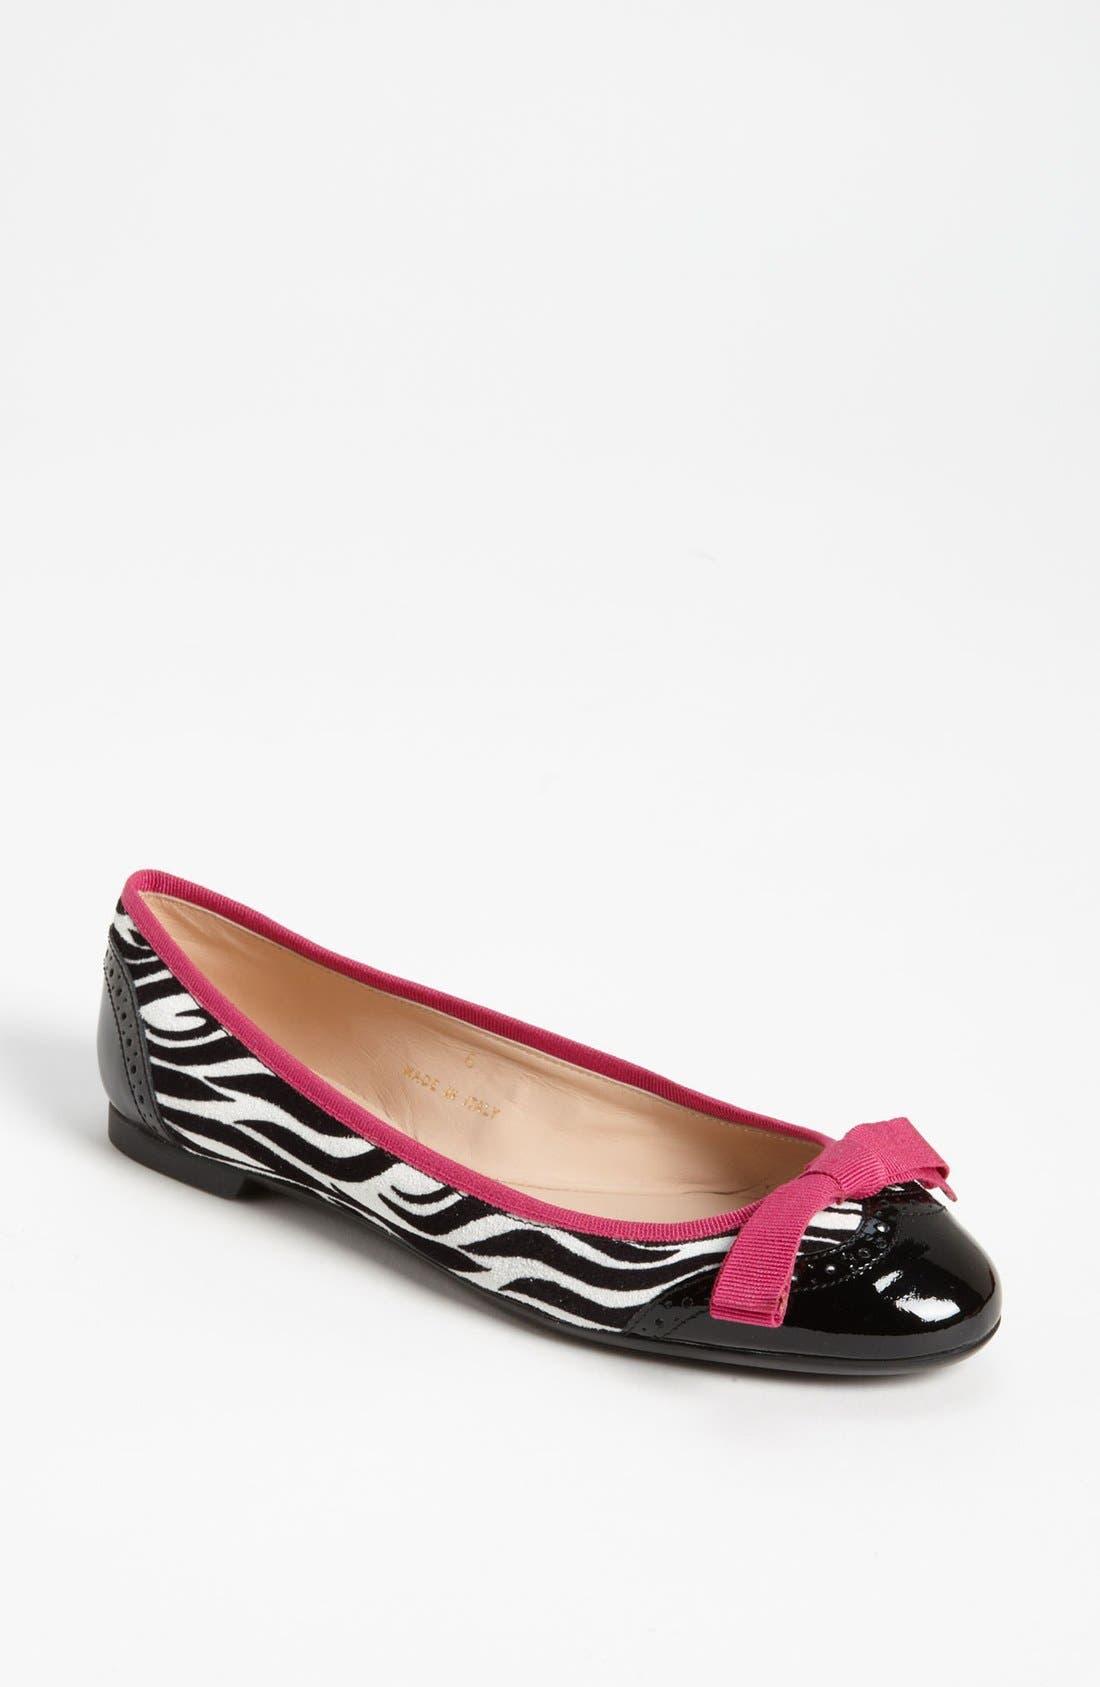 Main Image - Sweet Ballerina 'Biancospino' Zebra Print Ballet Flat